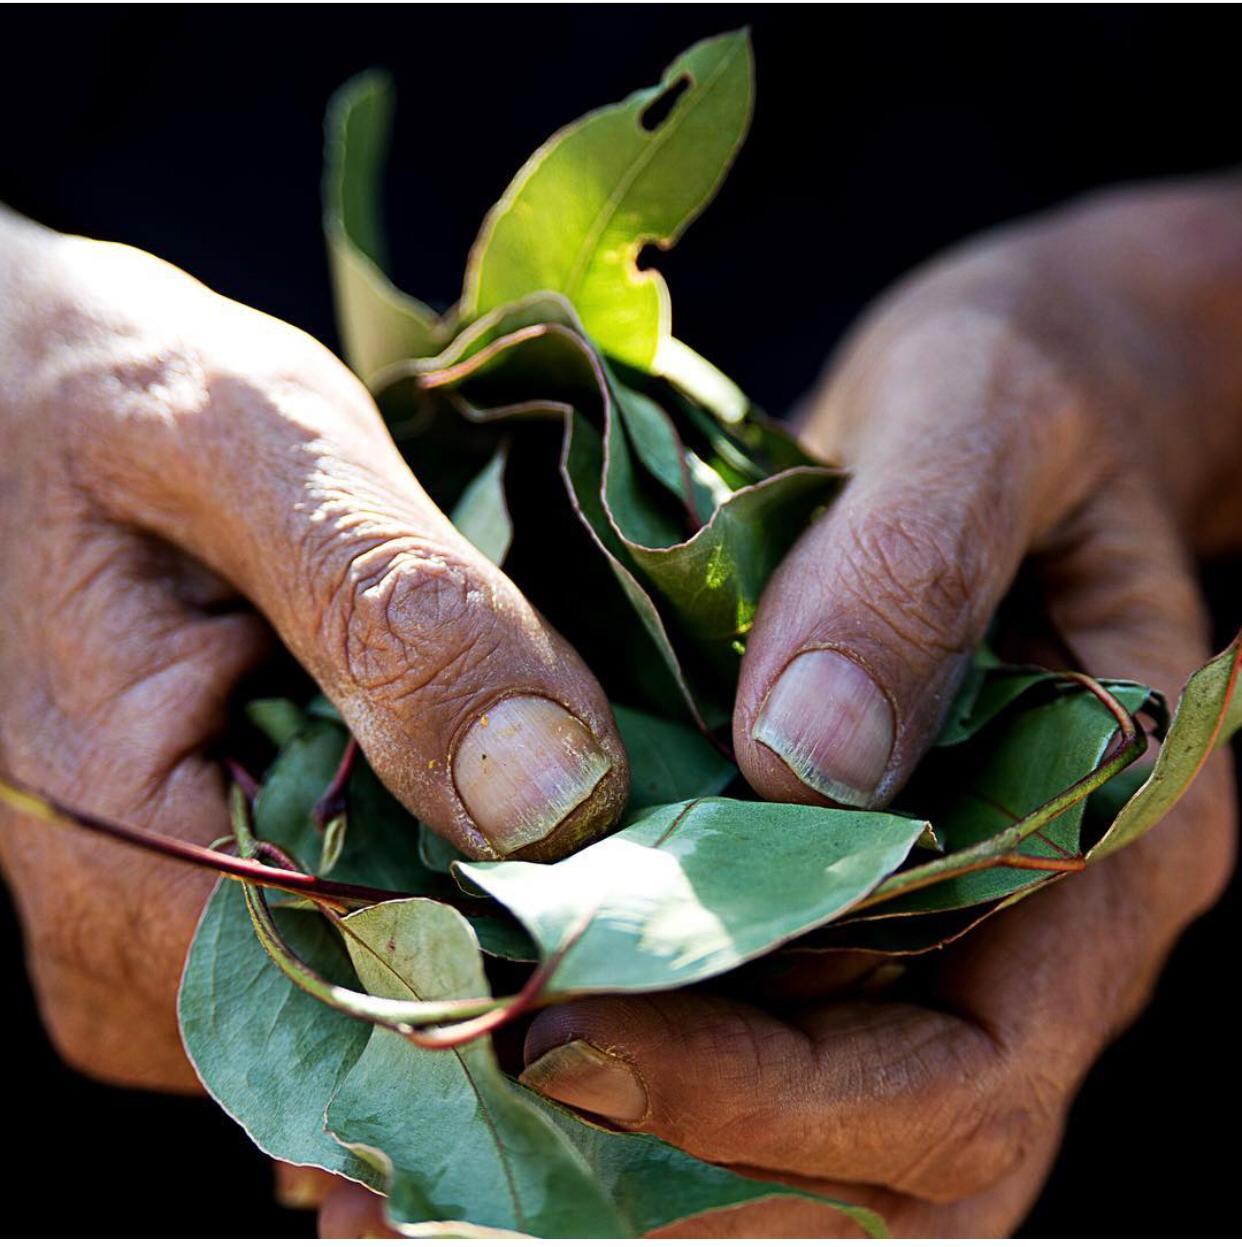 man holding leaves